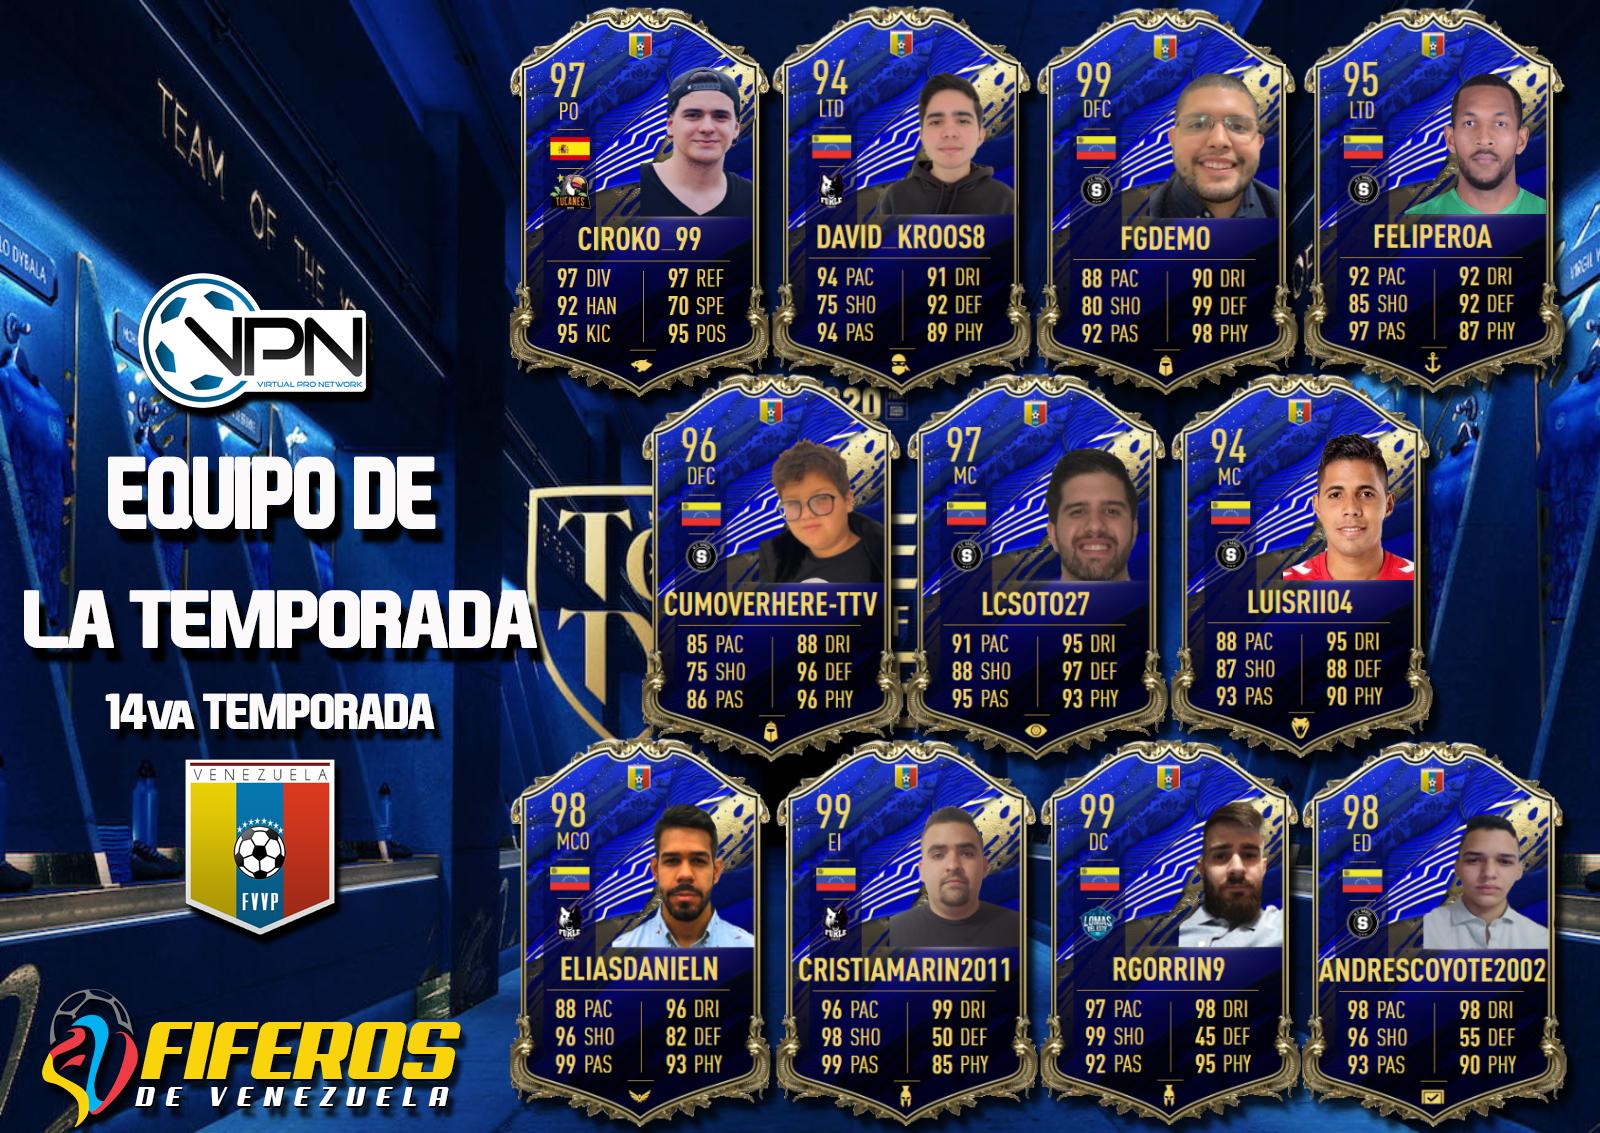 PS4-Equipo-Temporada-14